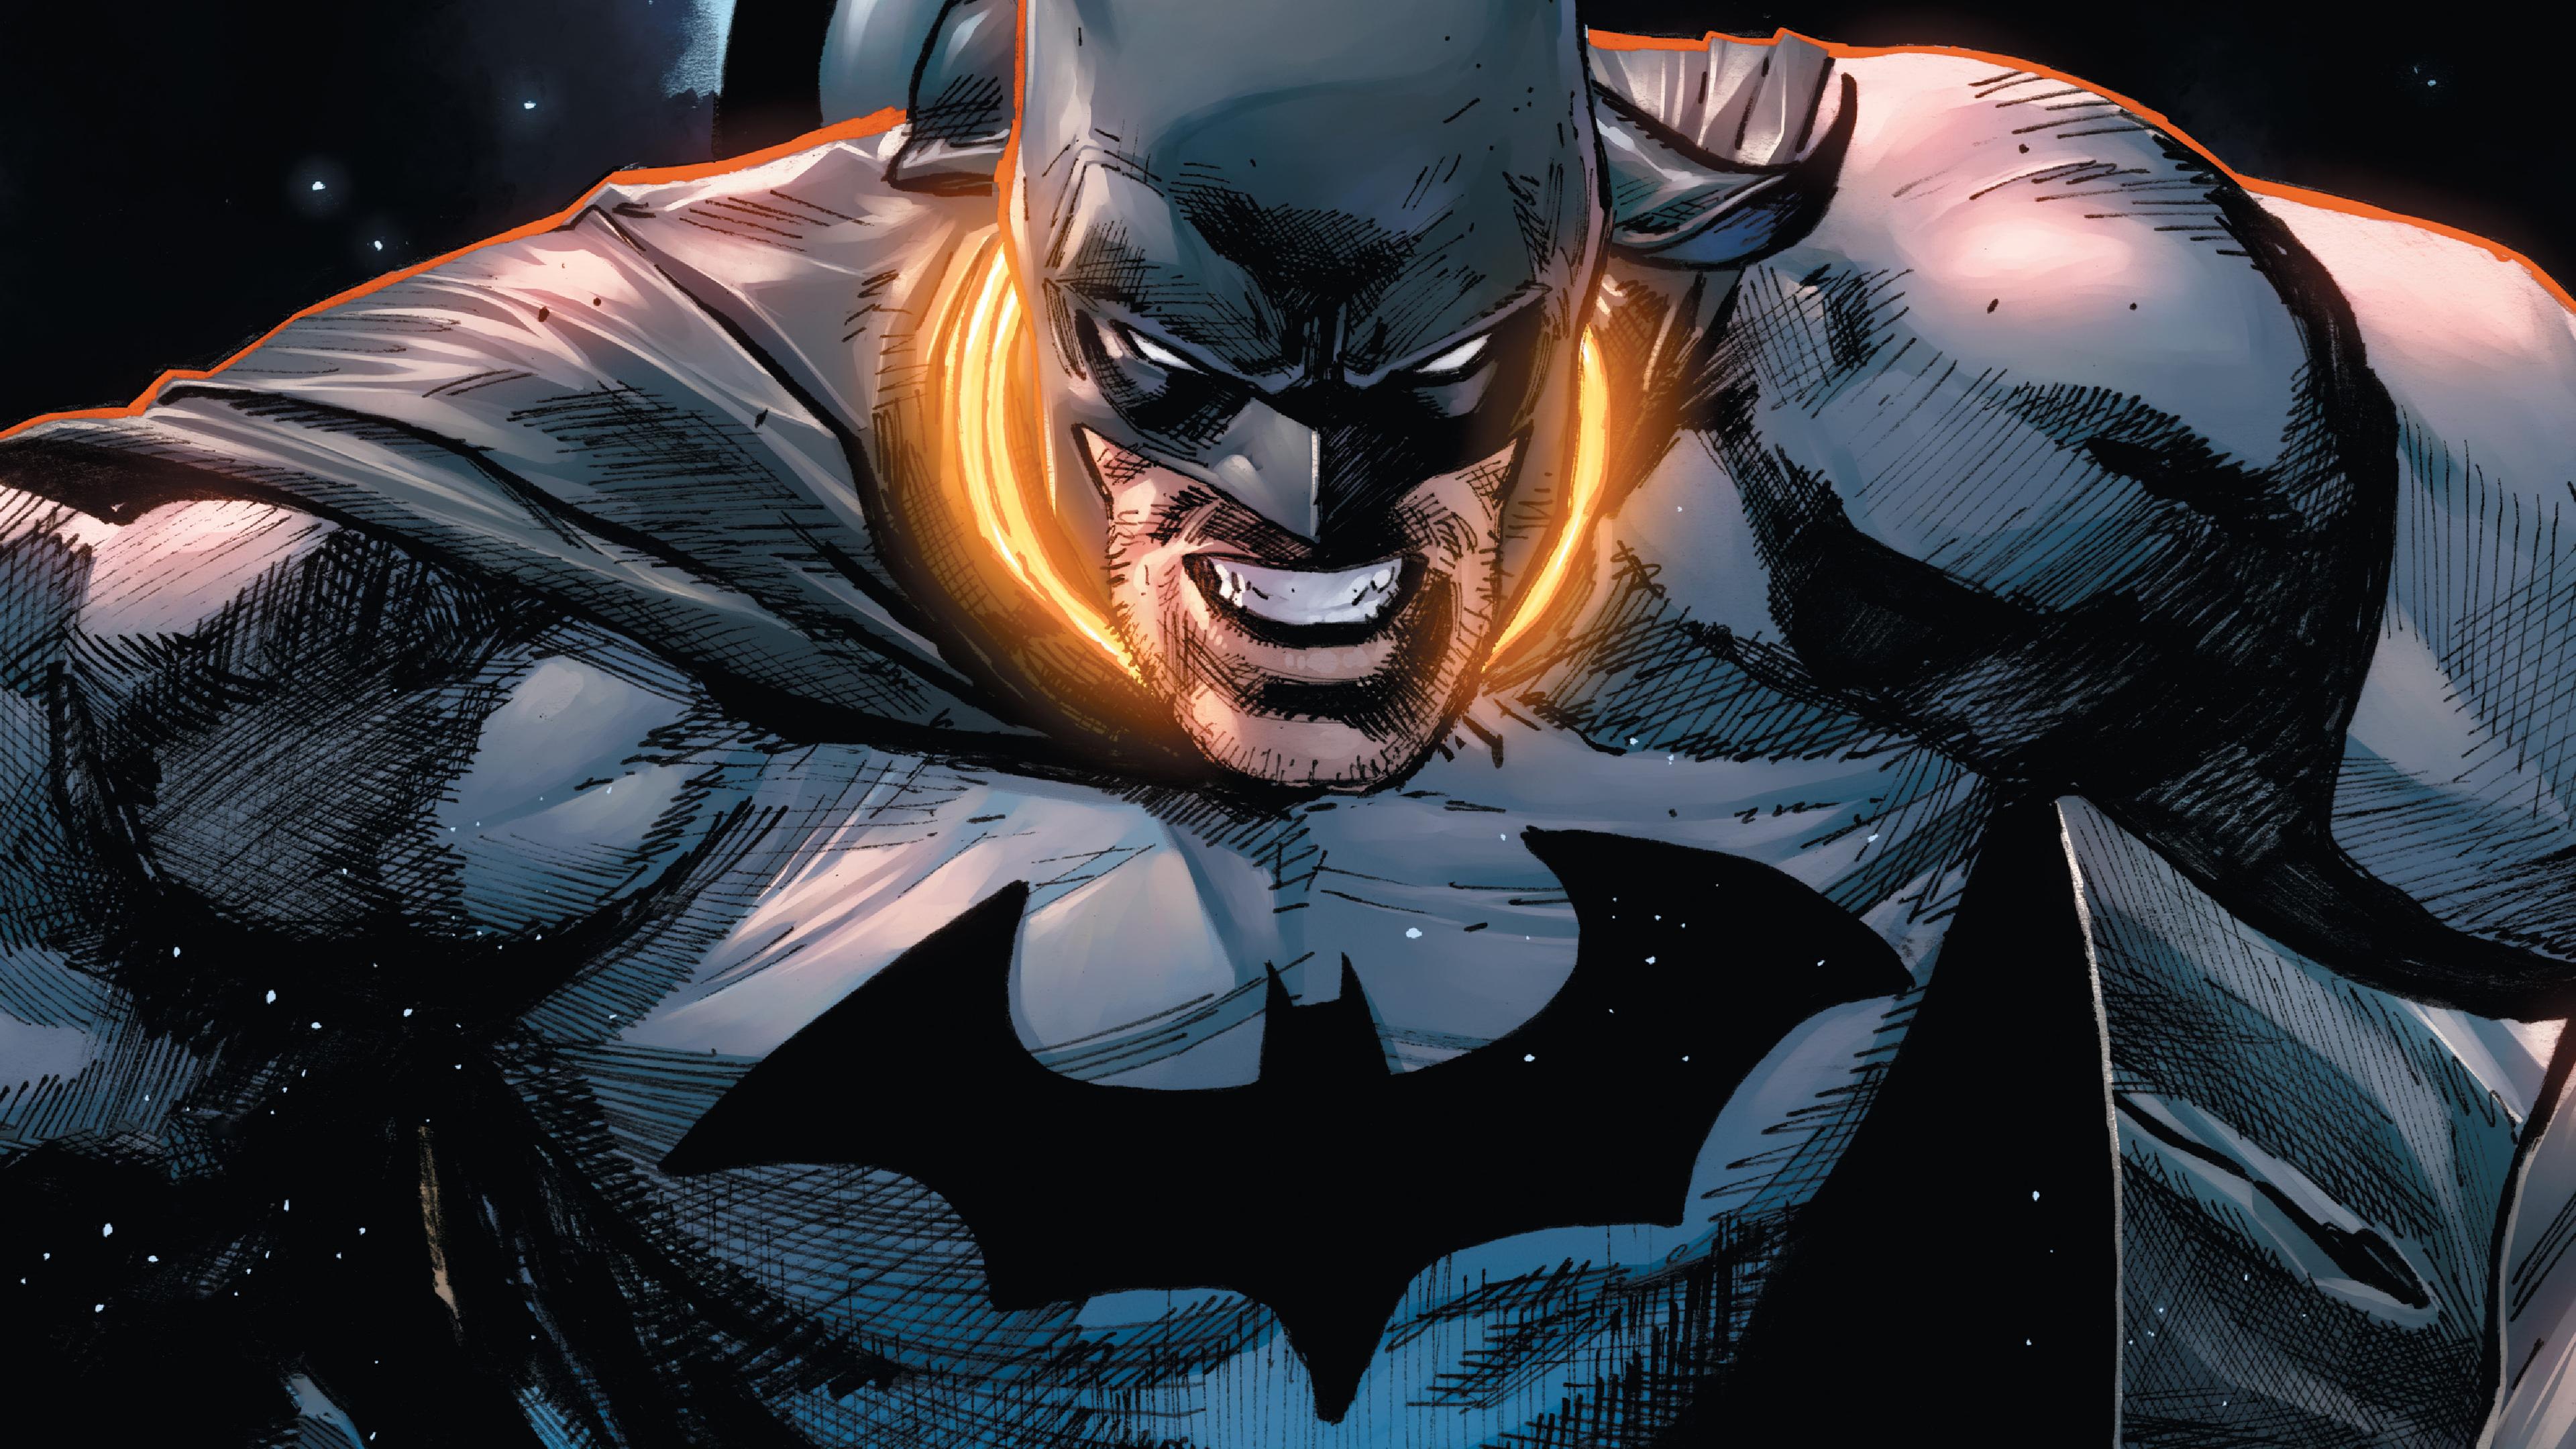 batman dark knight 4k 1547506396 - Batman Dark Knight 4k - superheroes wallpapers, hd-wallpapers, digital art wallpapers, batman wallpapers, artwork wallpapers